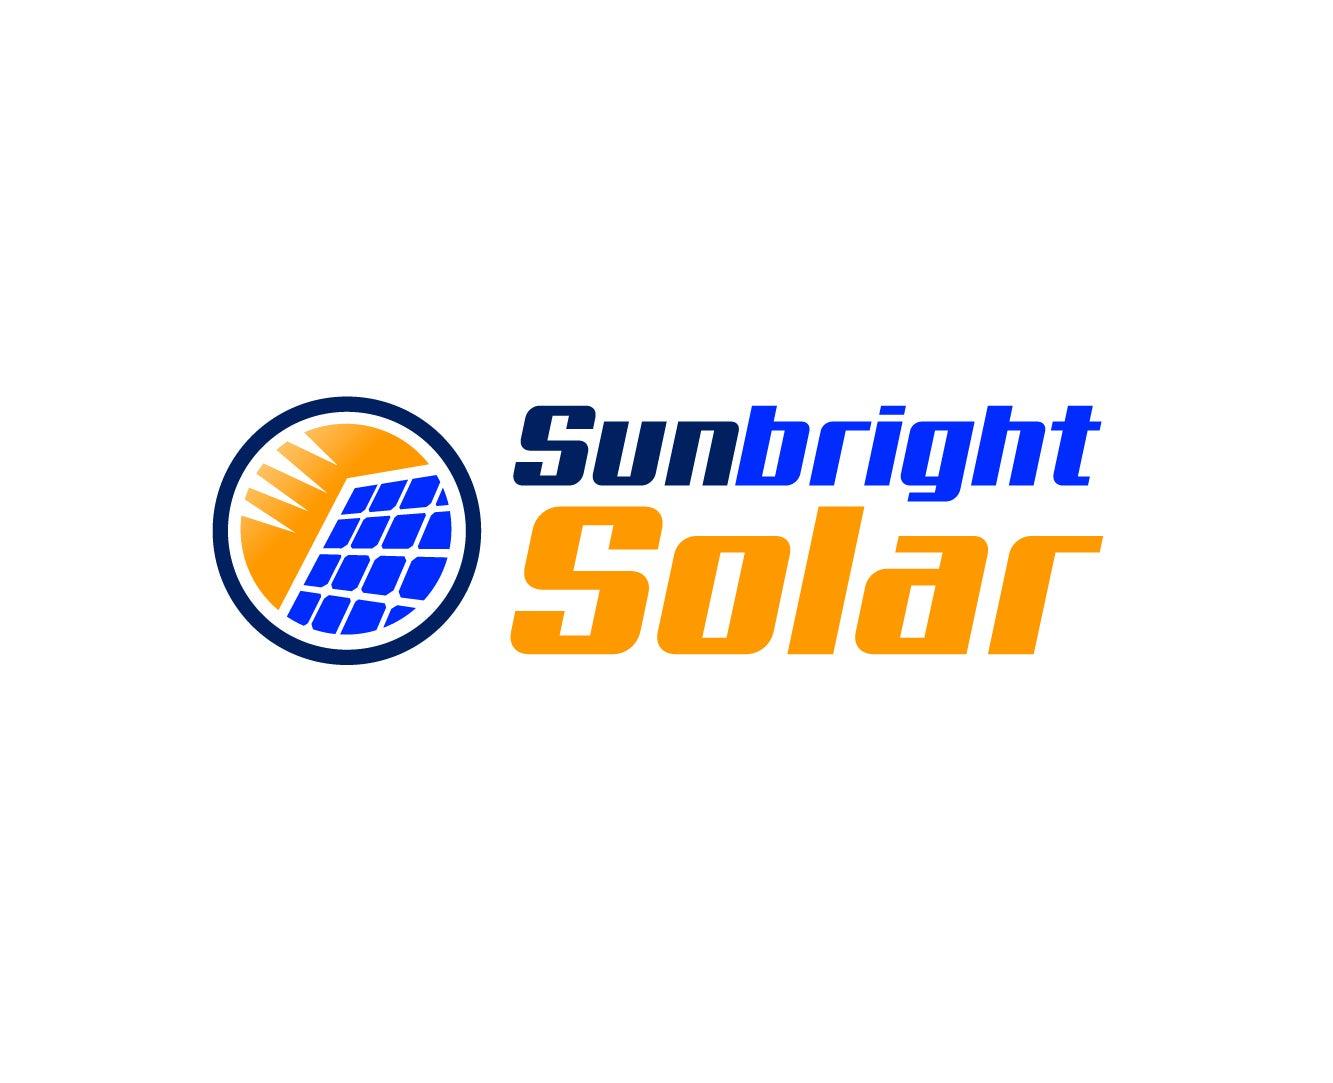 Vivint solar reviews california - Sunbright Solar Reviews Sunbright Solar Cost Sunbright Solar Panels Locations And Complaints